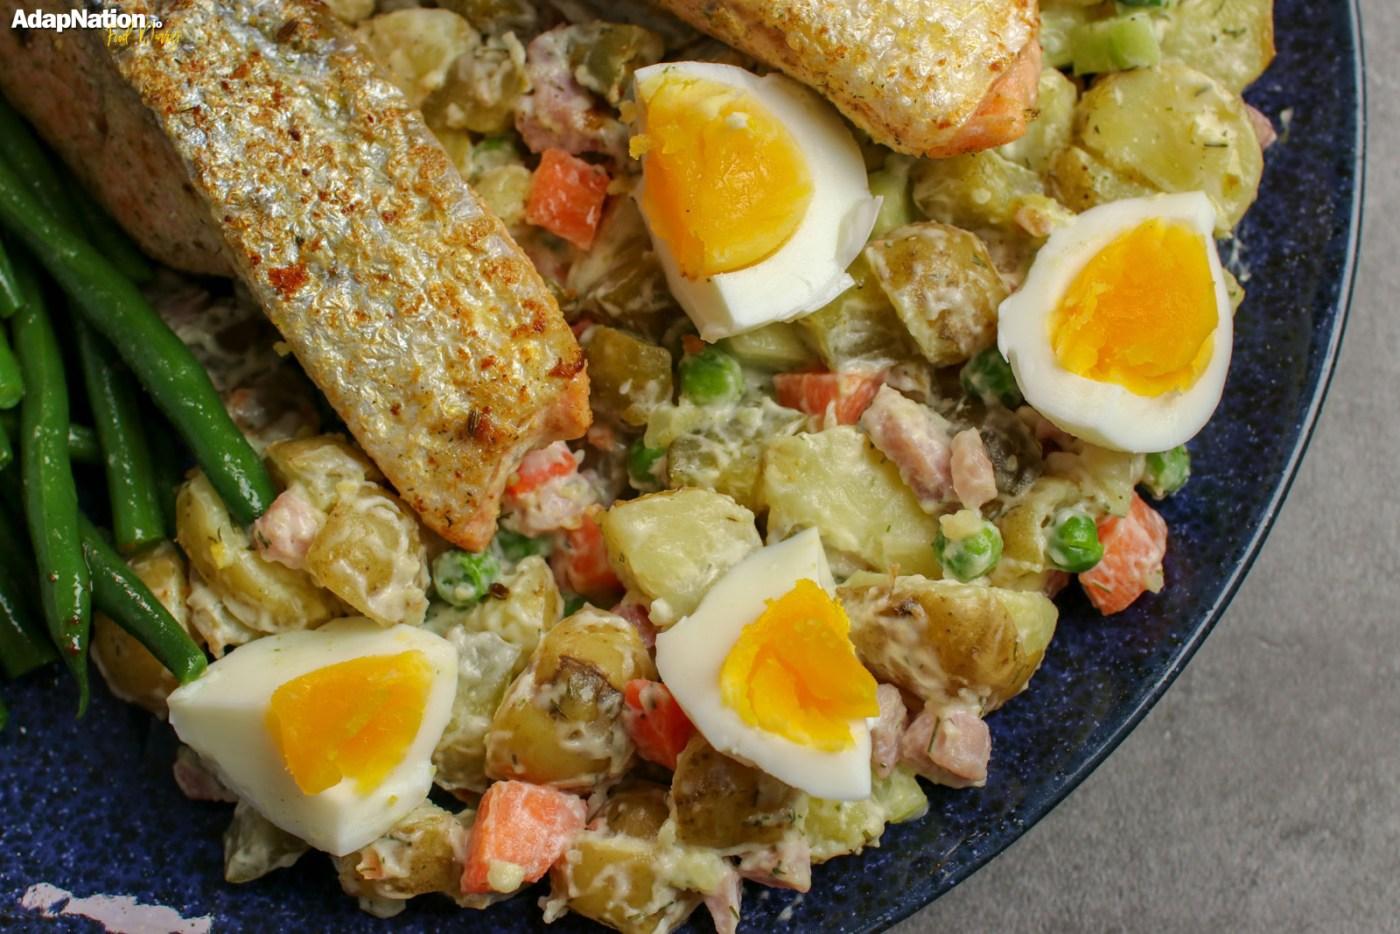 Crispy Salmon & Russian Salad